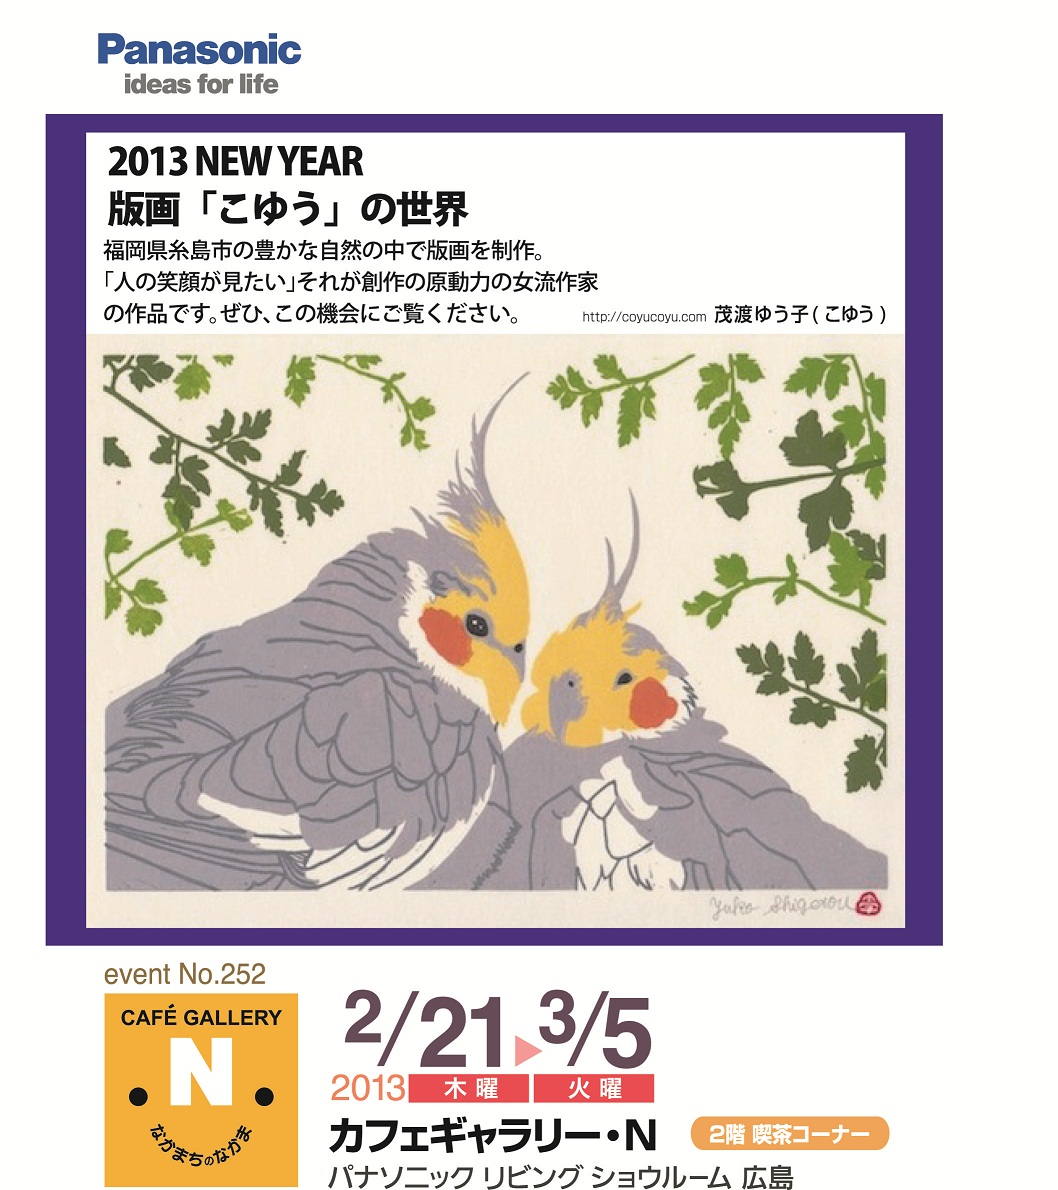 2013 NEW YEAR 版画「こゆう」の世界